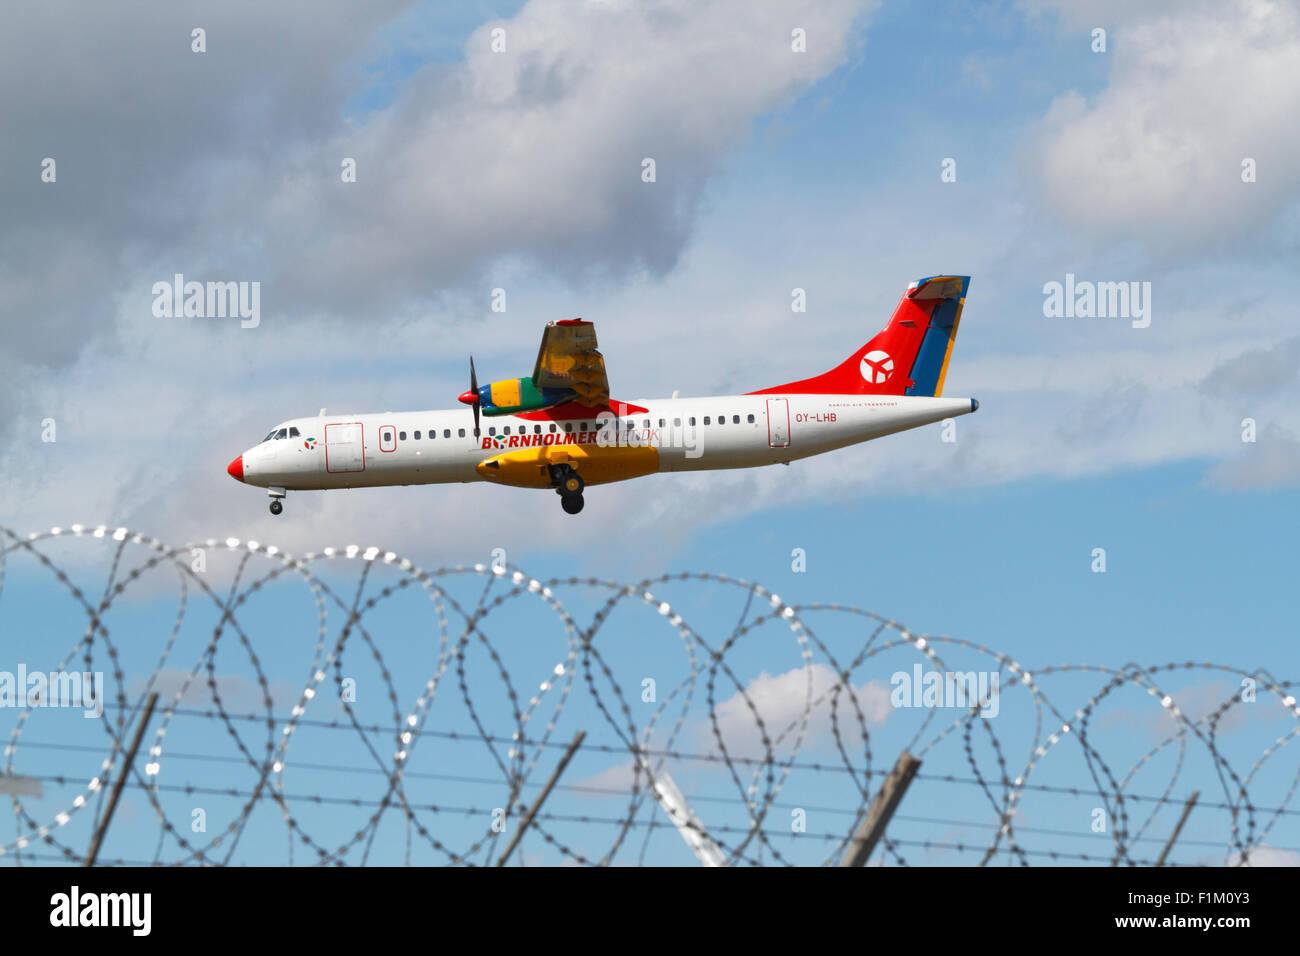 Bornholmerflyet Dk Atr 72 202 Danish Air Transport Dat Oy Lhb